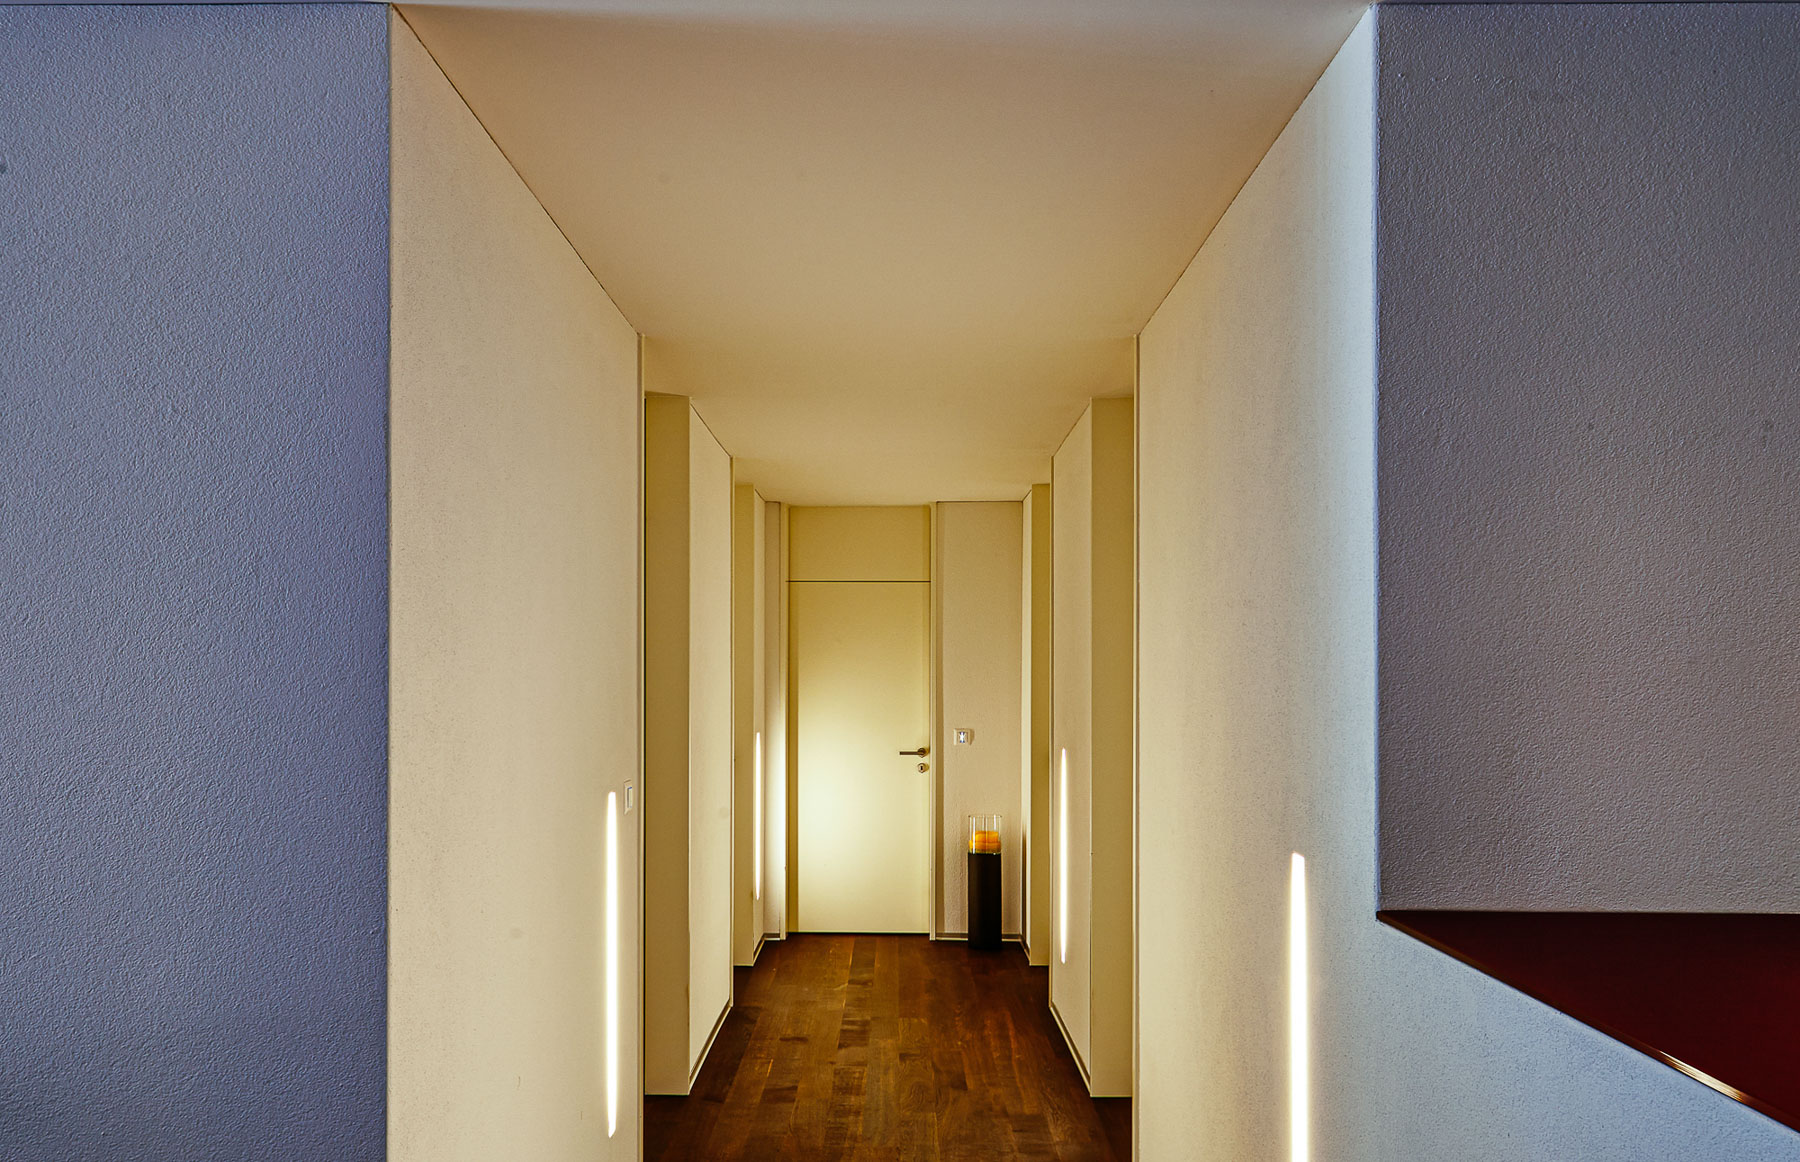 09-Korridor-bearbeitet